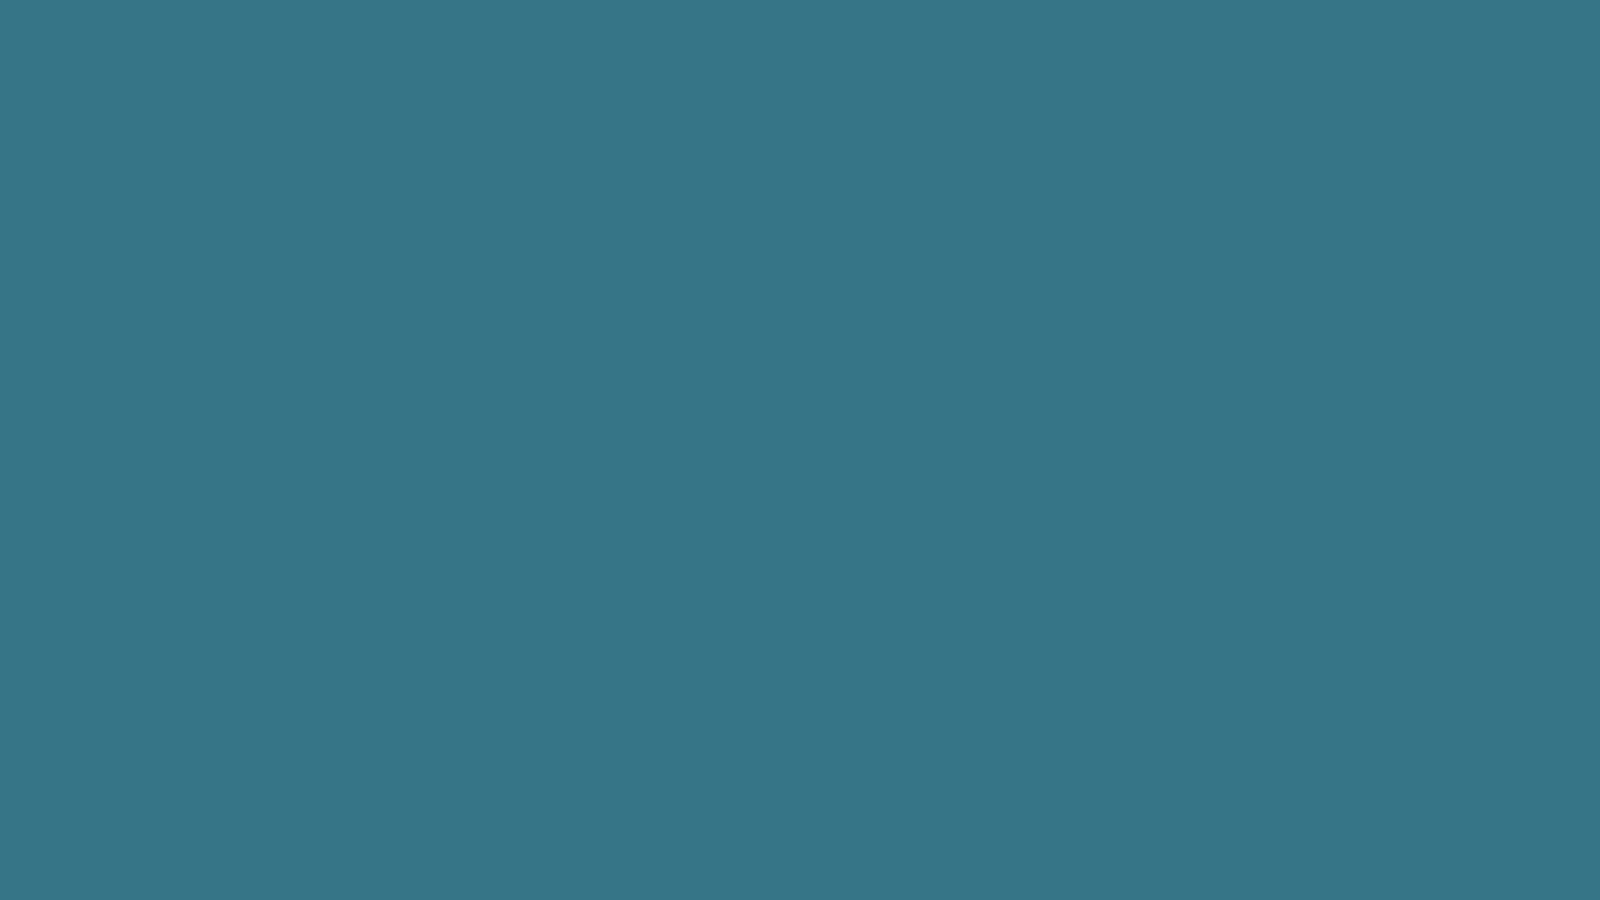 1600x900 Teal Blue Solid Color Background